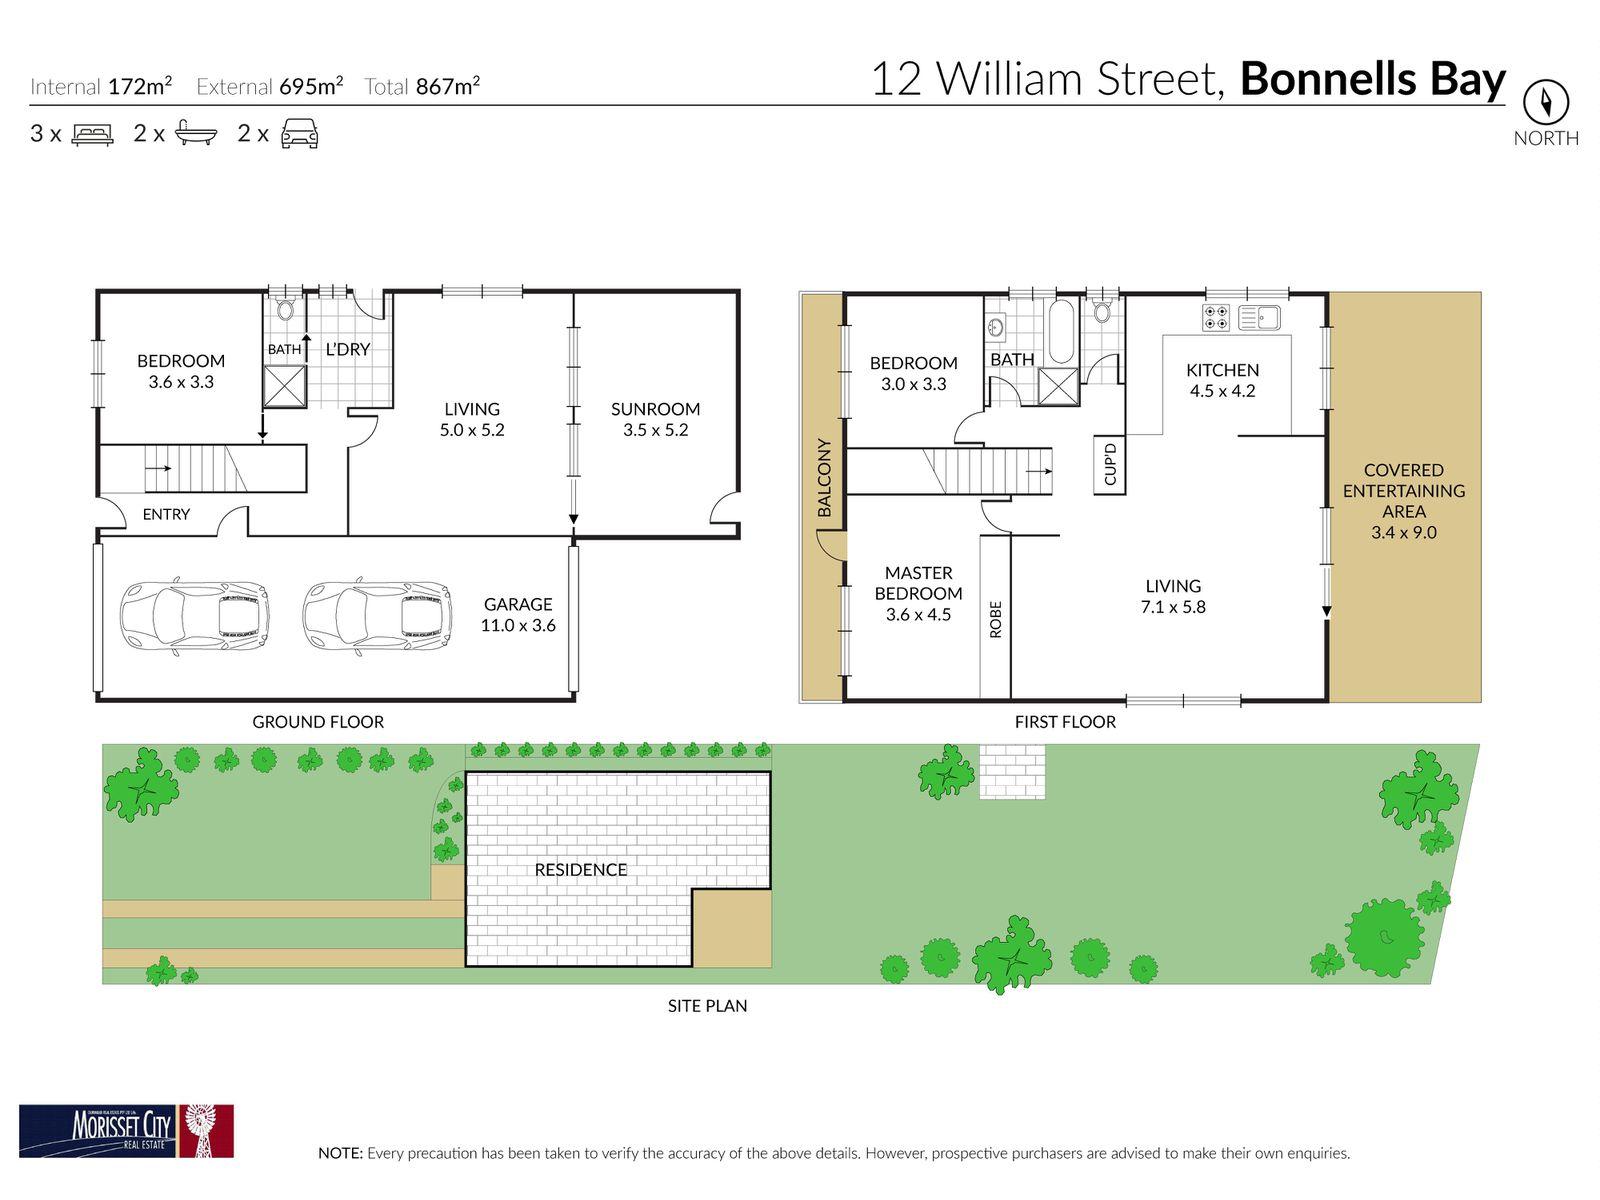 12 William Street, Bonnells Bay